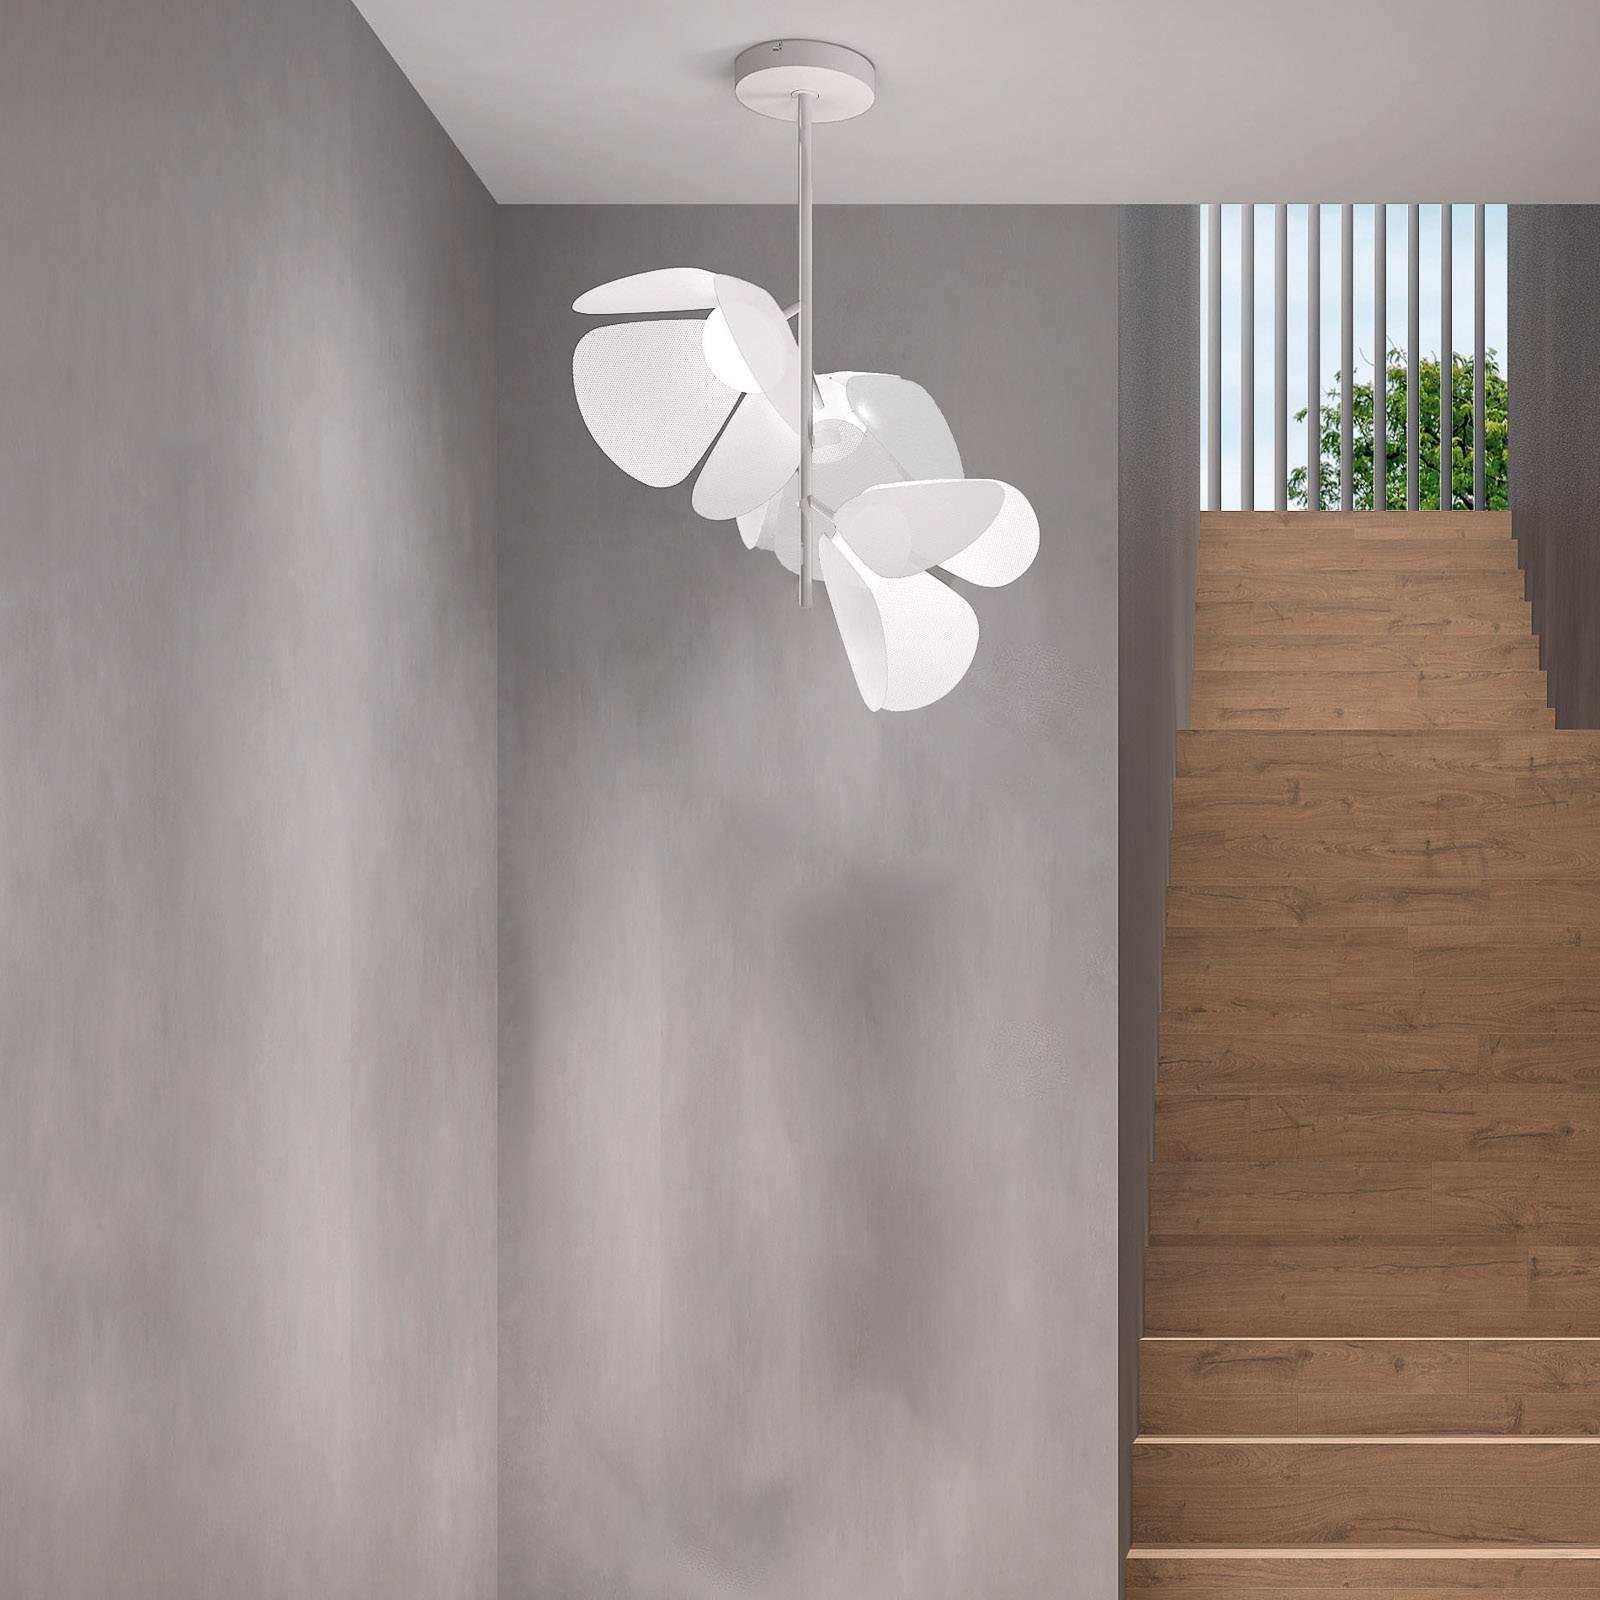 Bover Mod PF/73/3L LED-kattovalaisin, valkoinen